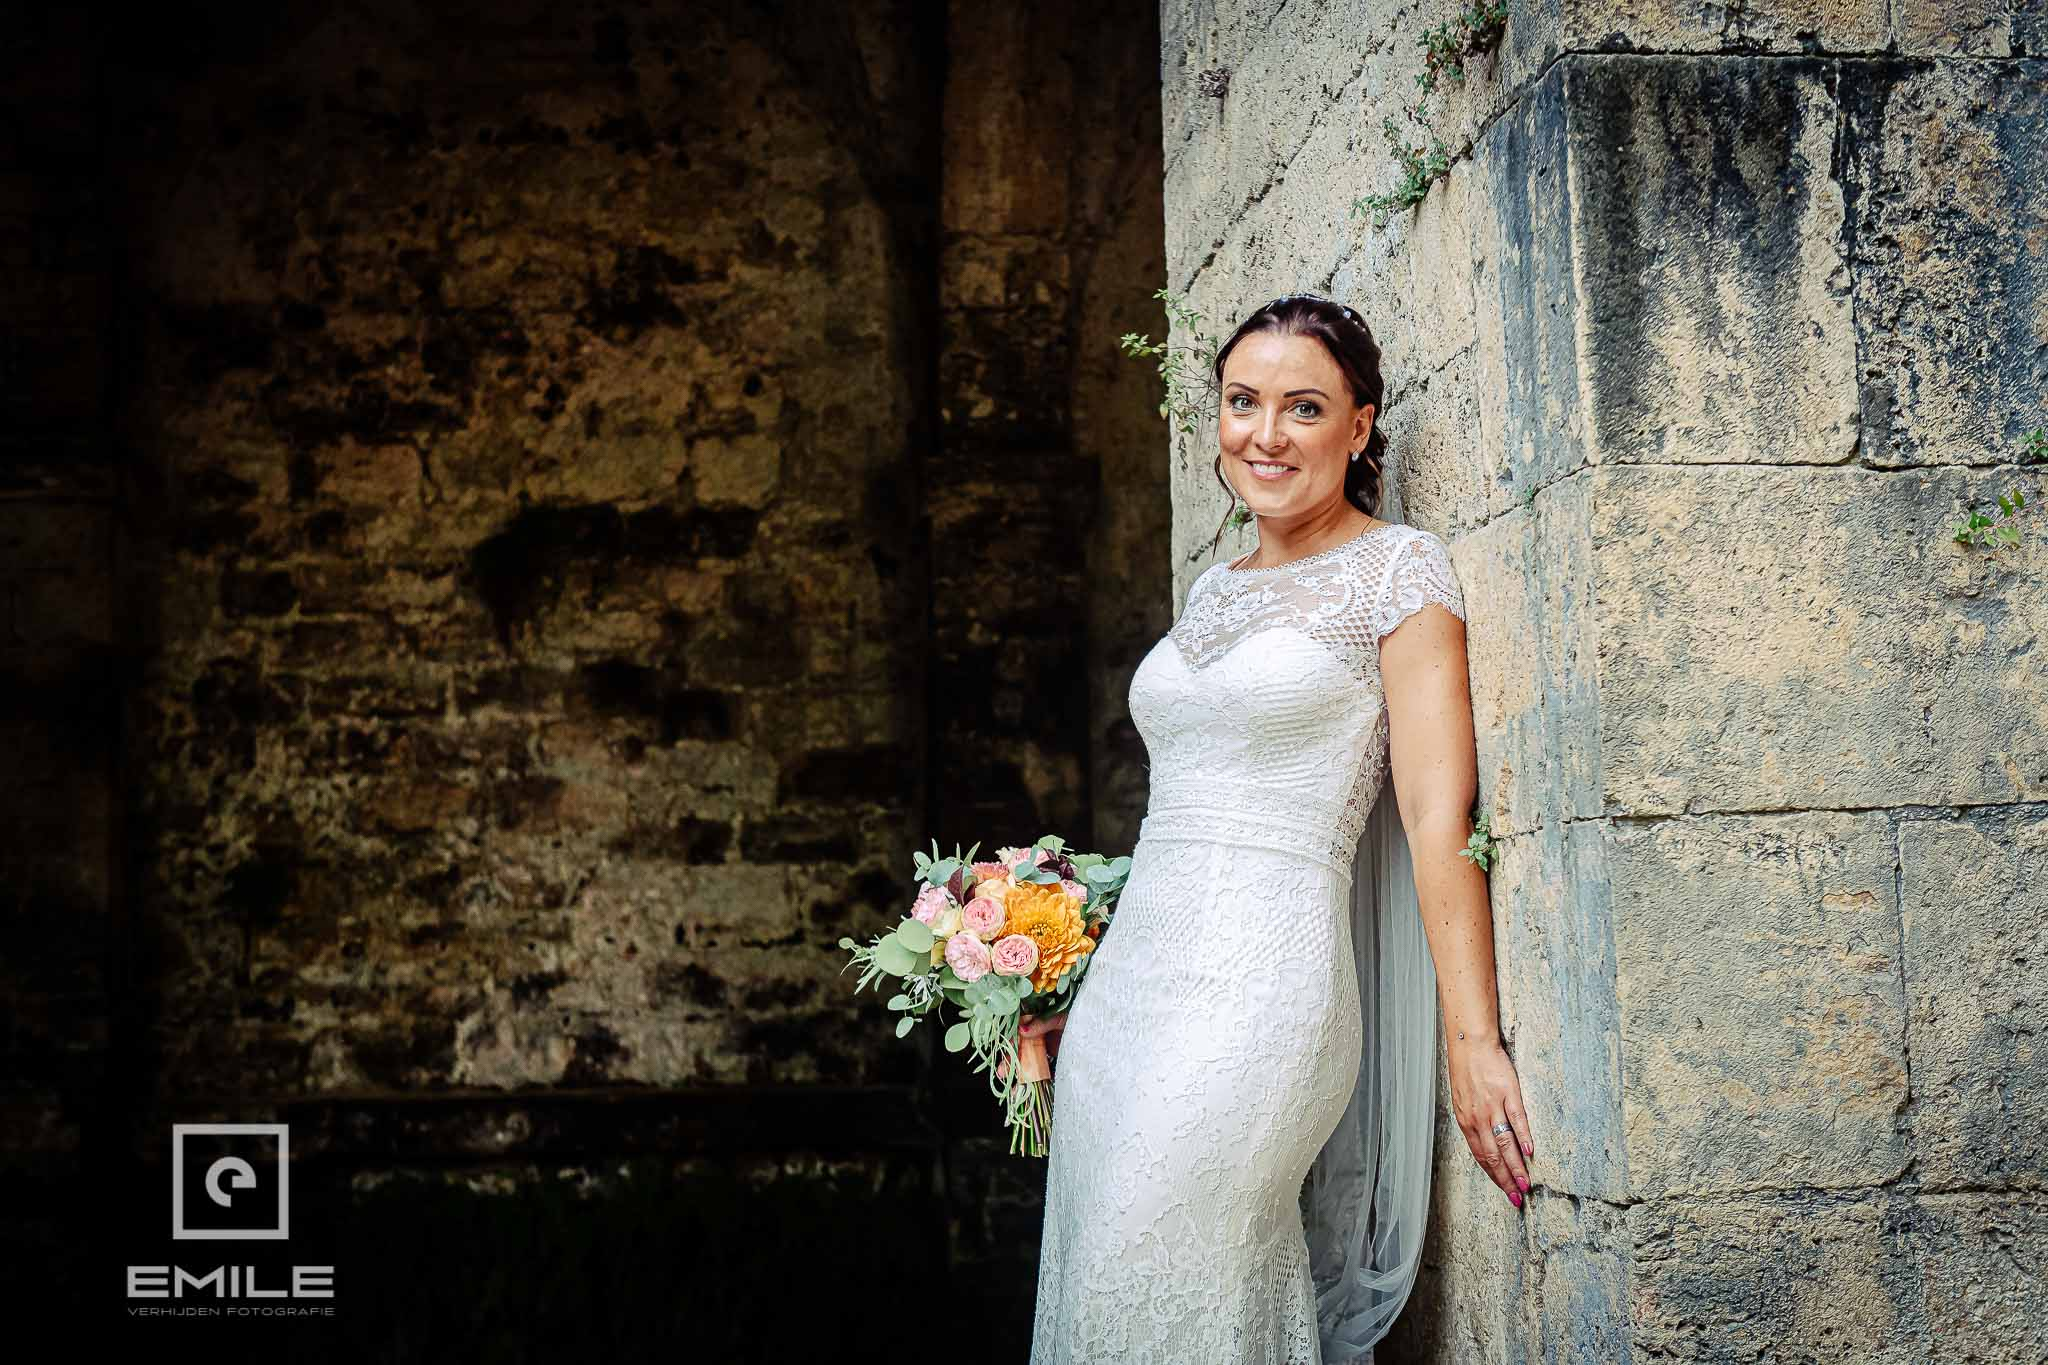 Bruid bij de ruine van Poggibonsi - Destination wedding San Gimignano - Toscane Italie - Iris en Job